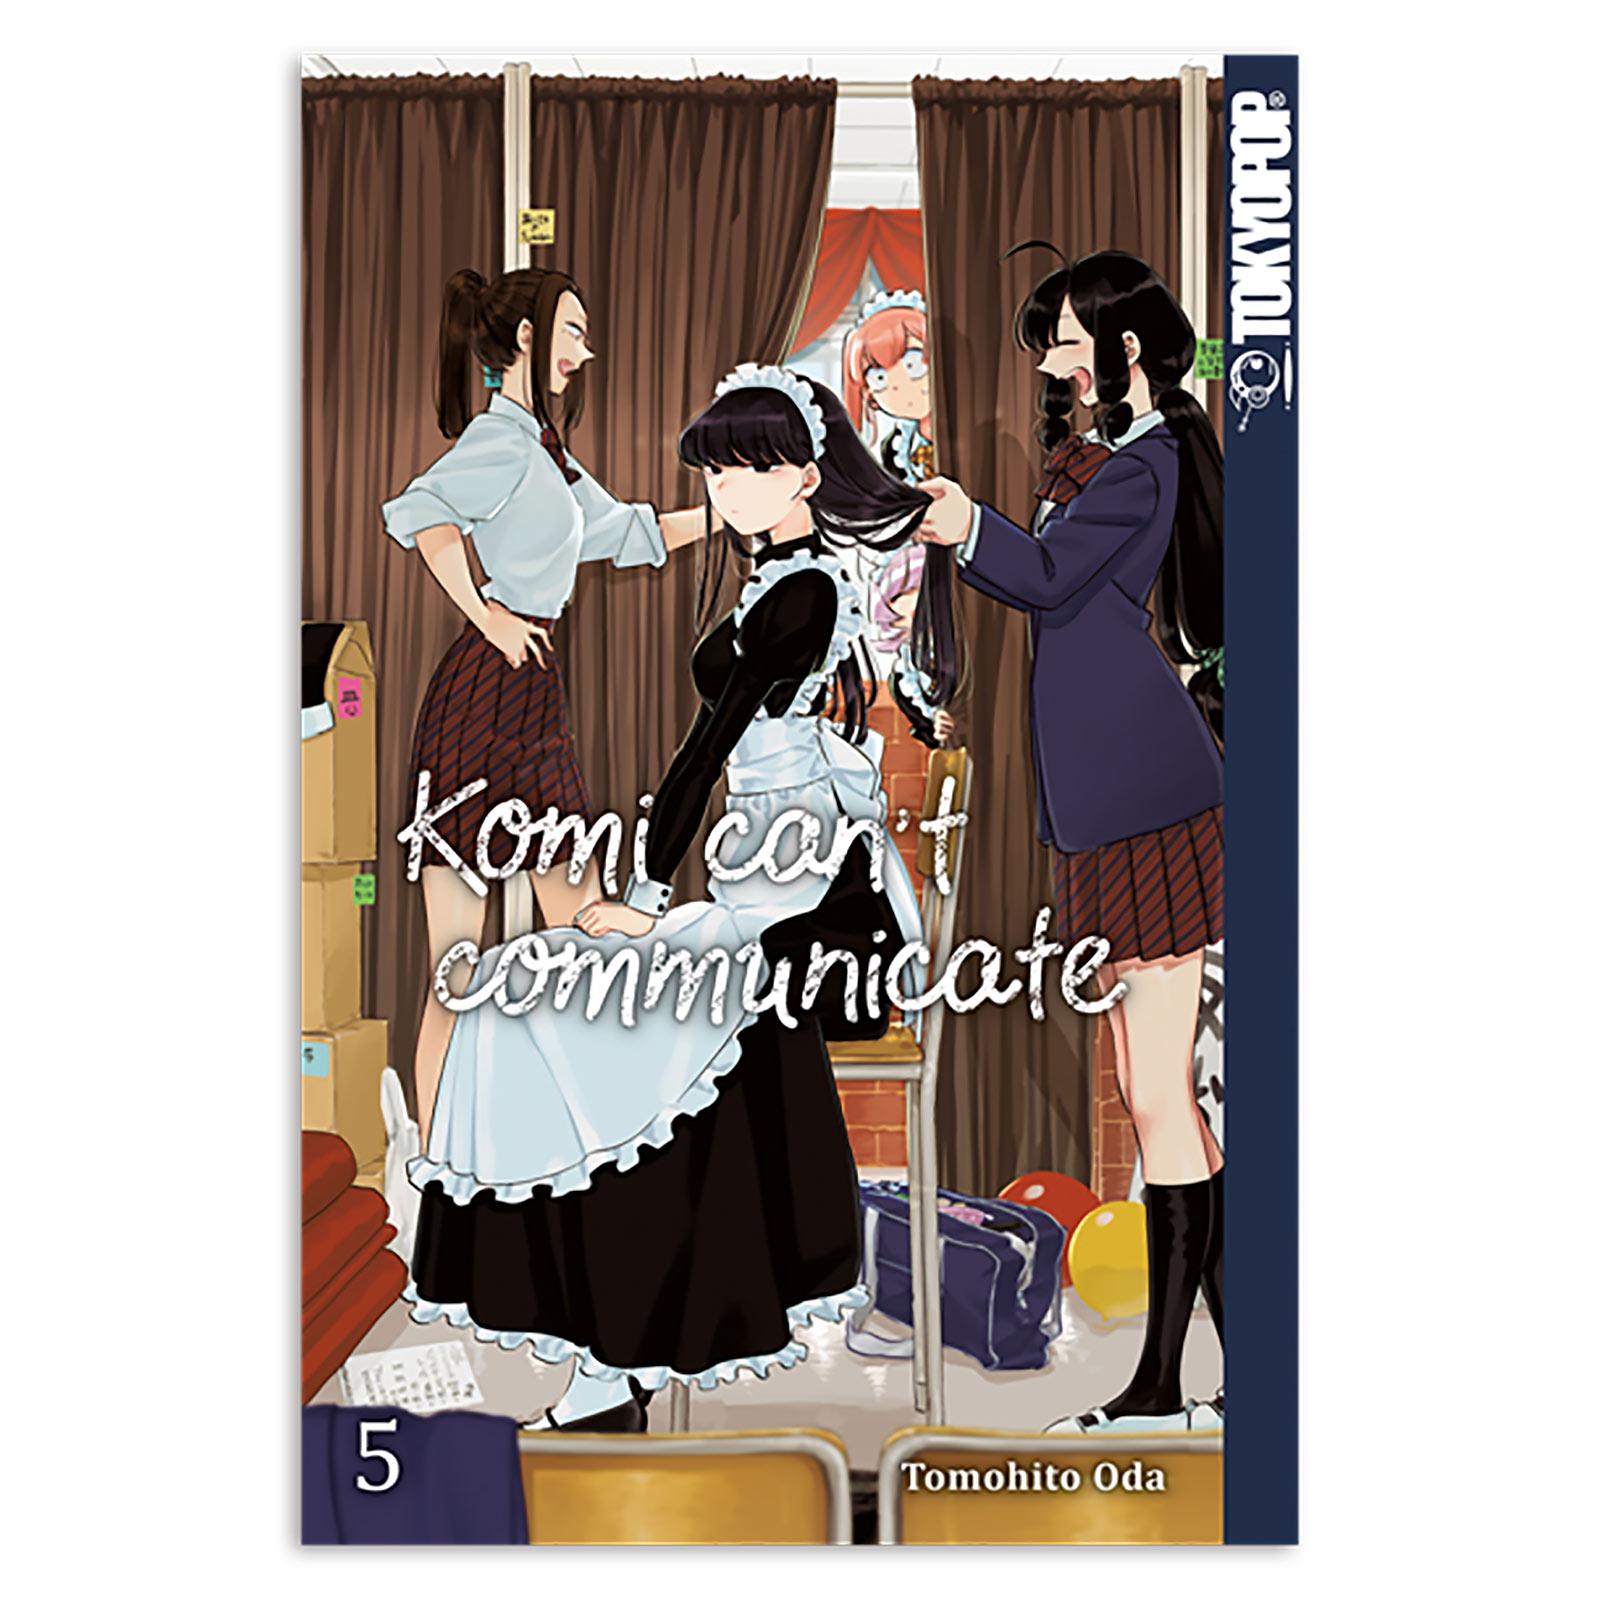 Komi can't communicate - Band 5 Taschenbuch